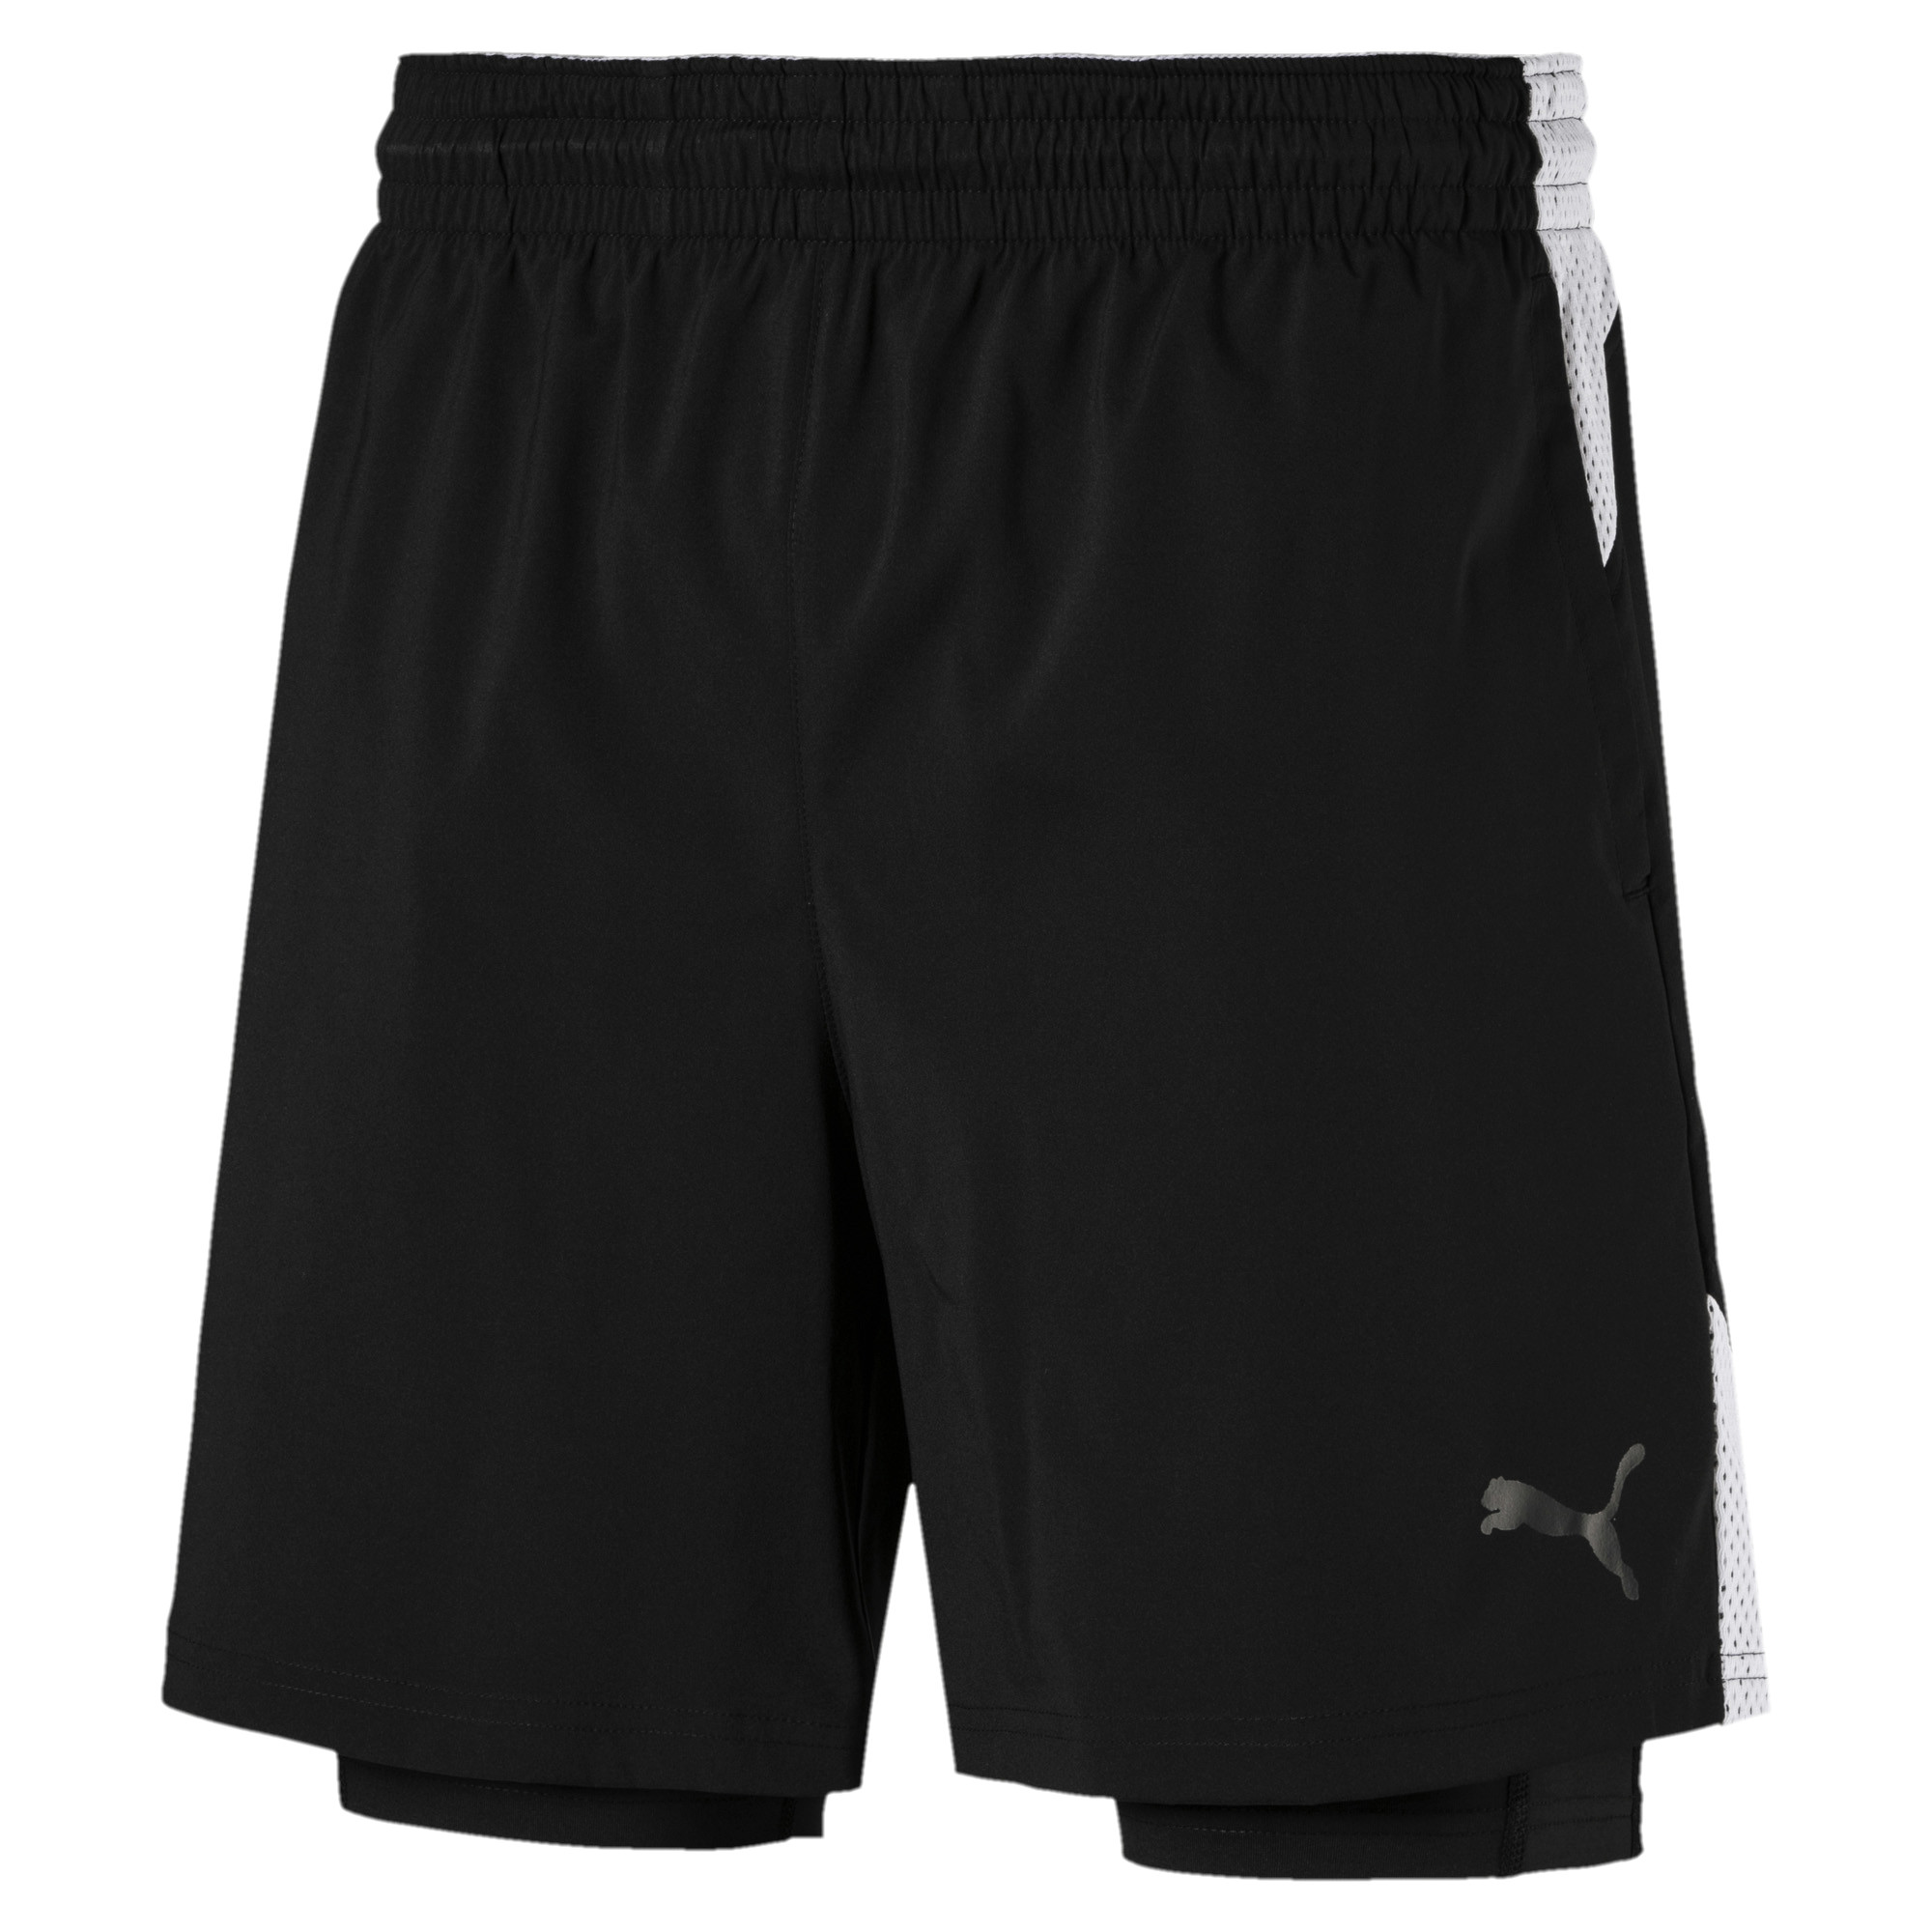 Image Puma A.C.E. Woven 2 in 1 Men's Training Shorts #2